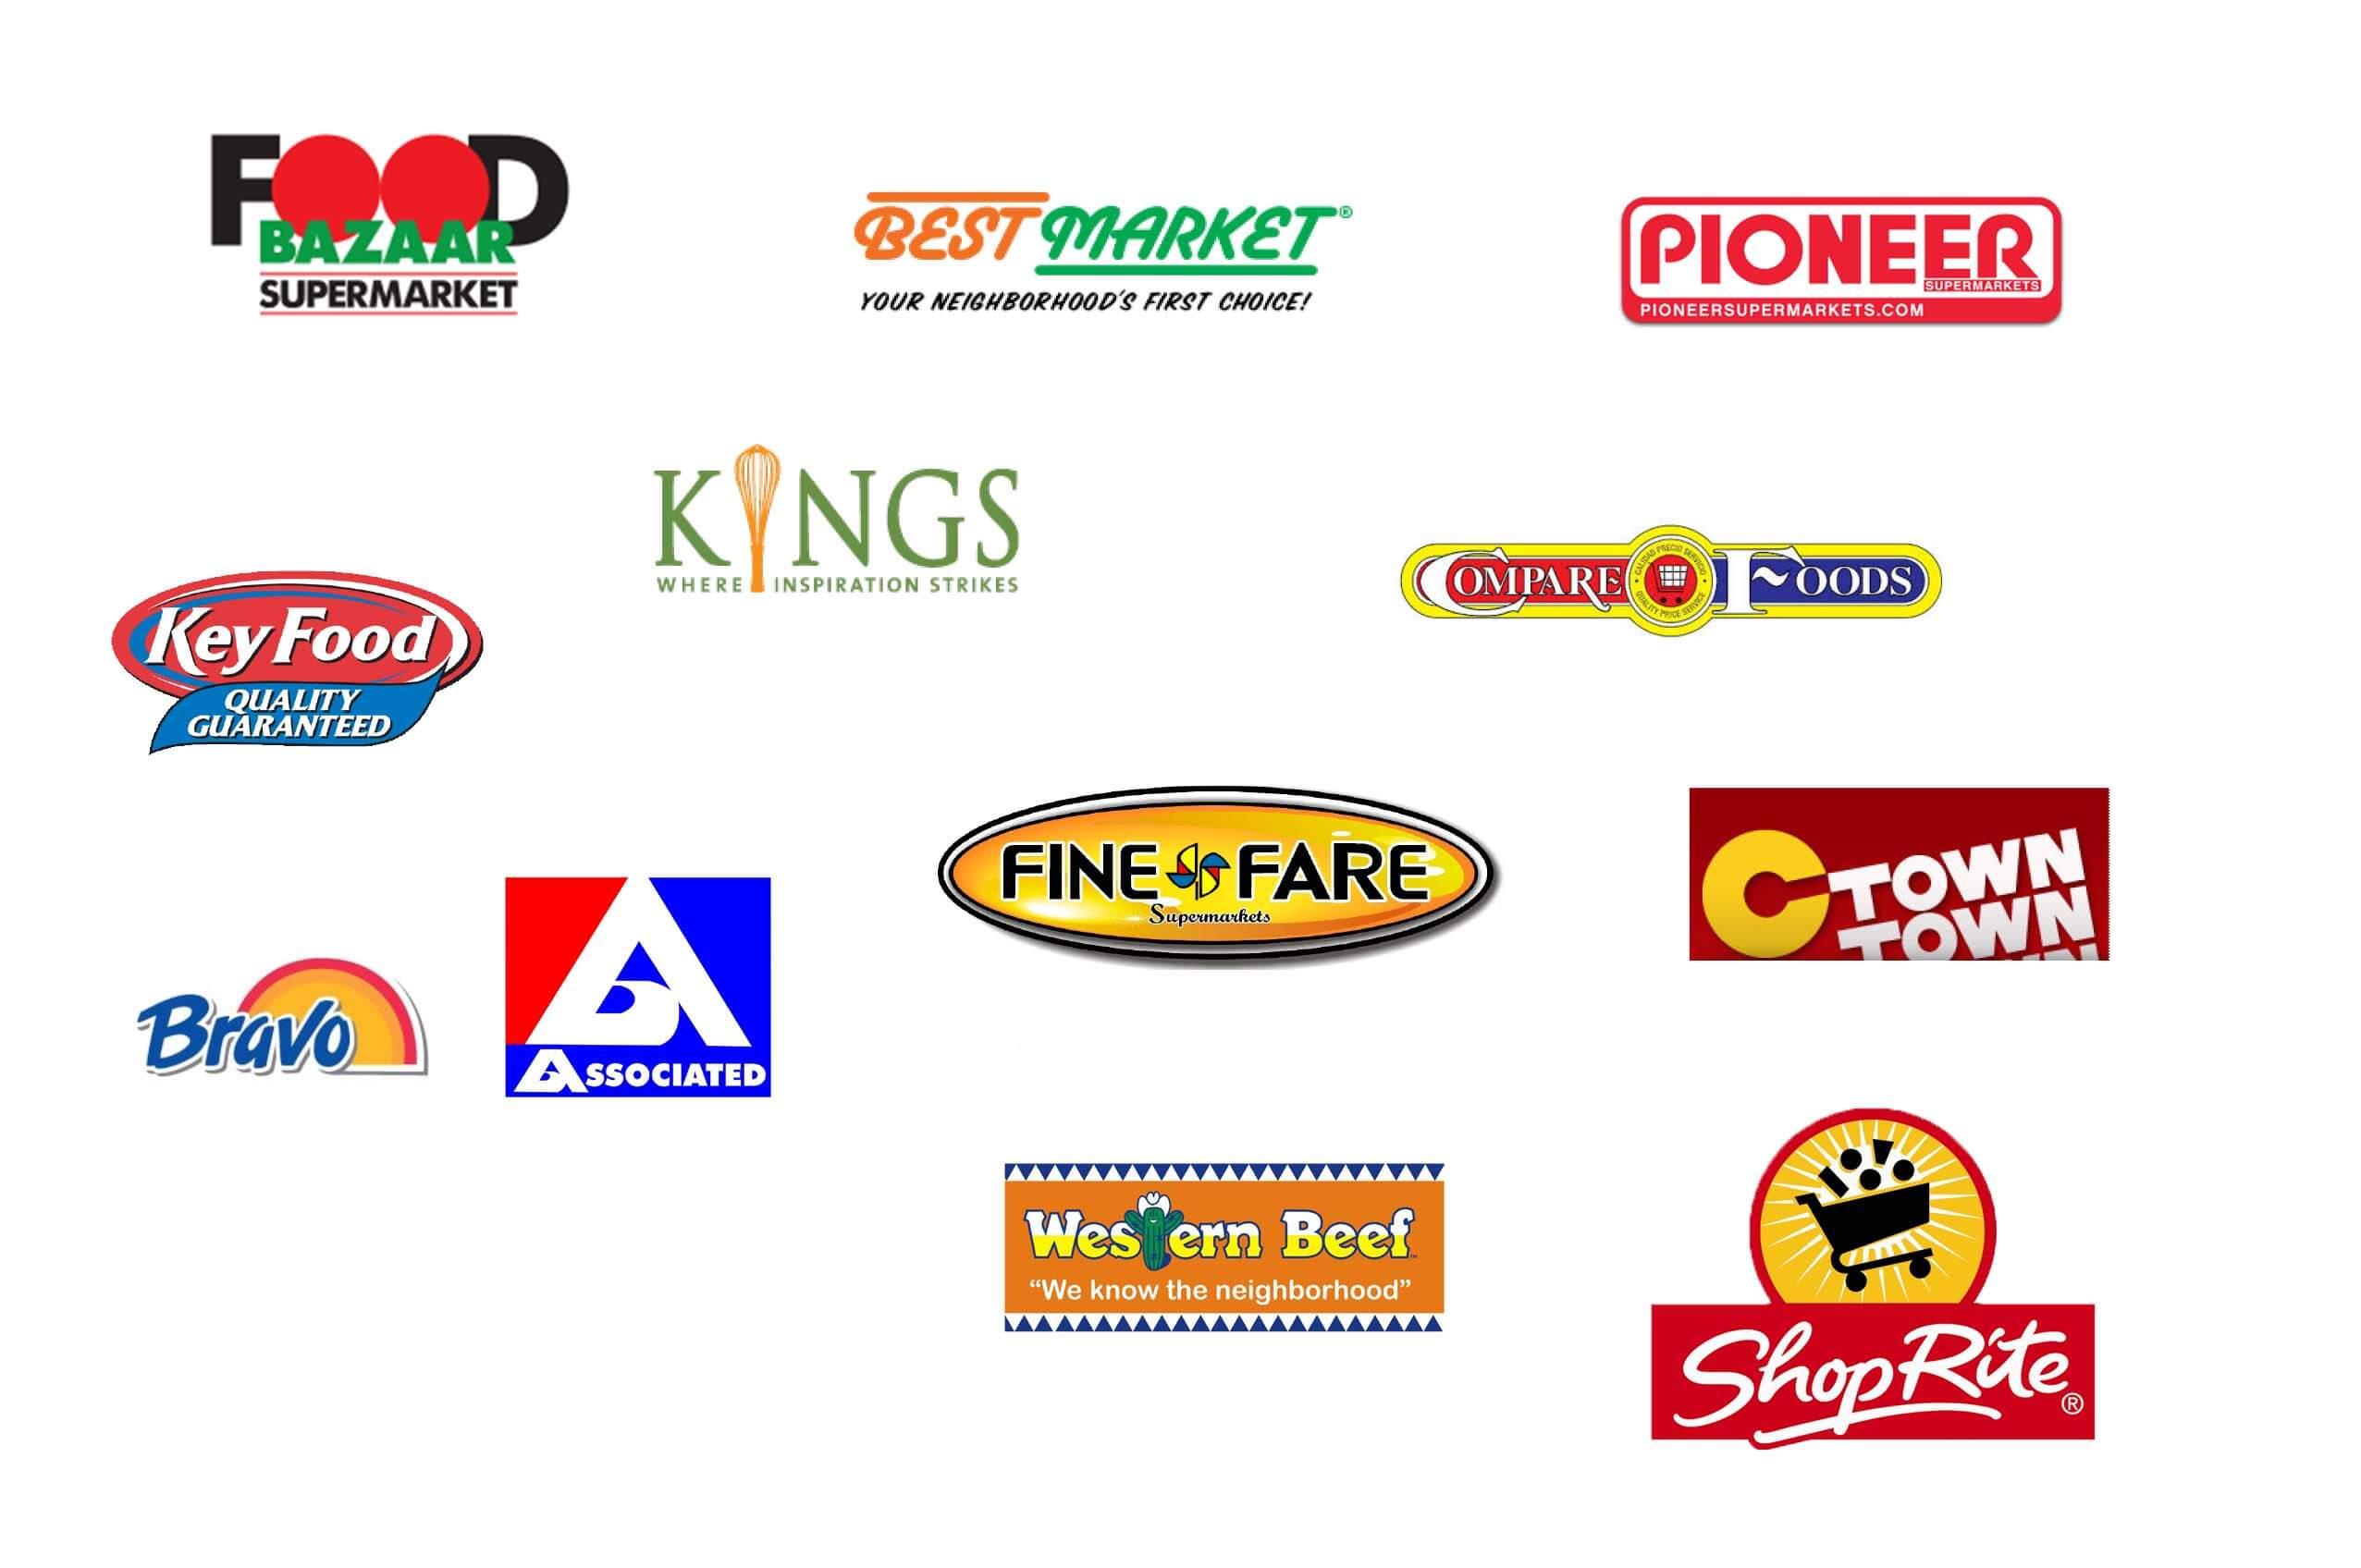 Food Label Customer Service Telephone